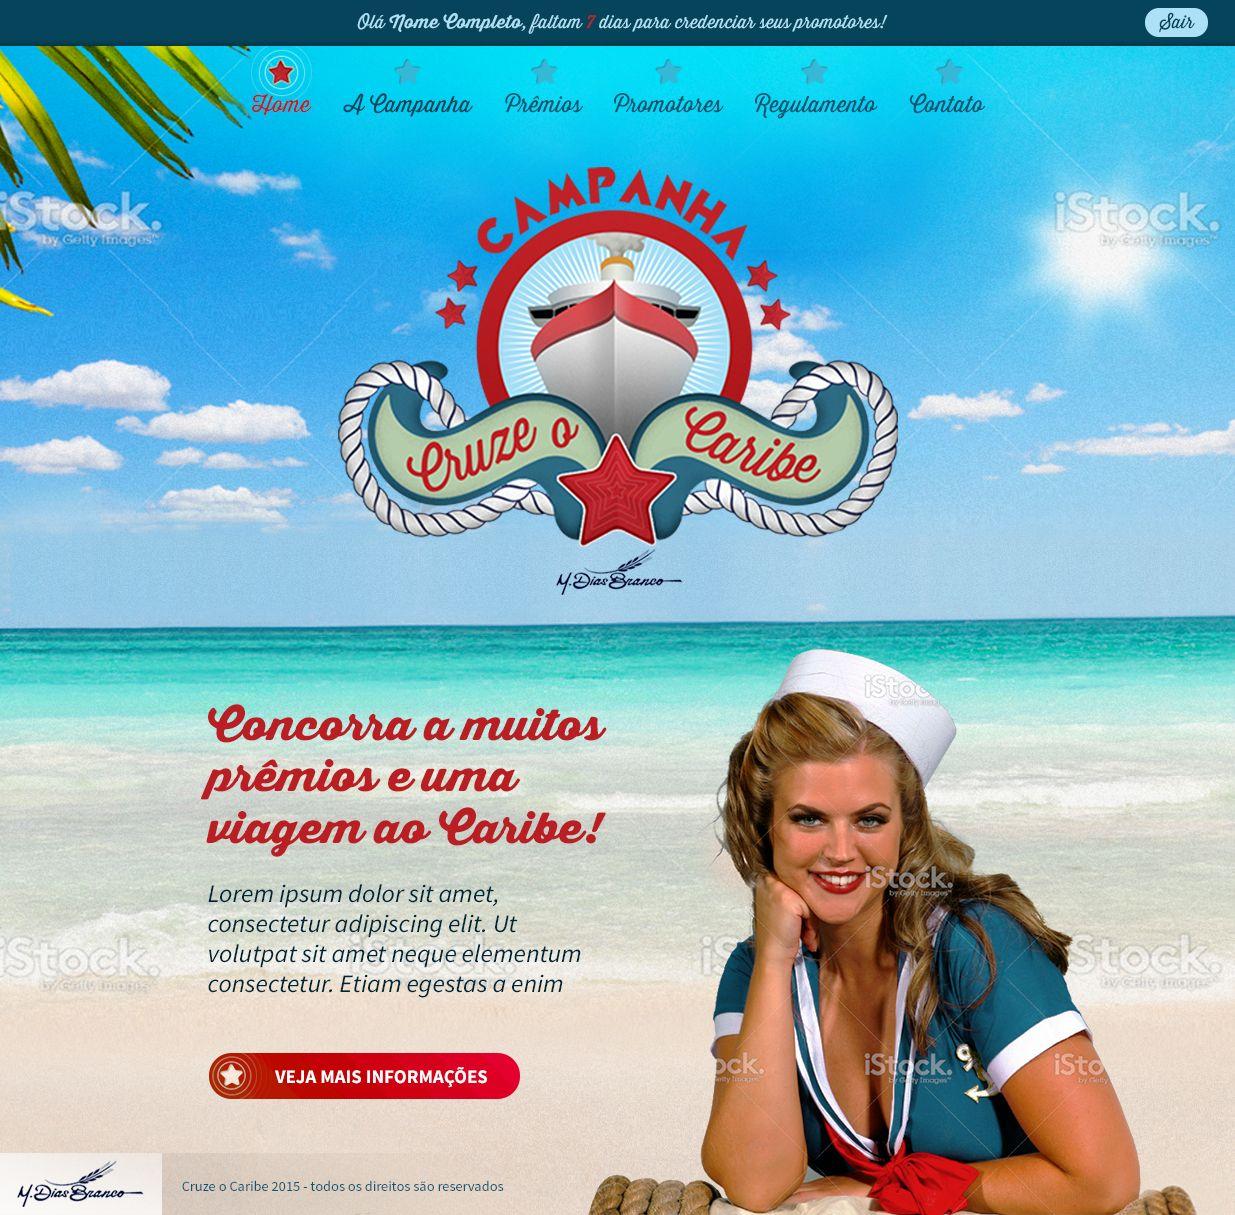 Website retrô. Advertise Promocional.  Campanha de incentivo website  #website #retro #advertise #advertising #promotion #pinup #caribe #beach #brazilian #brazil